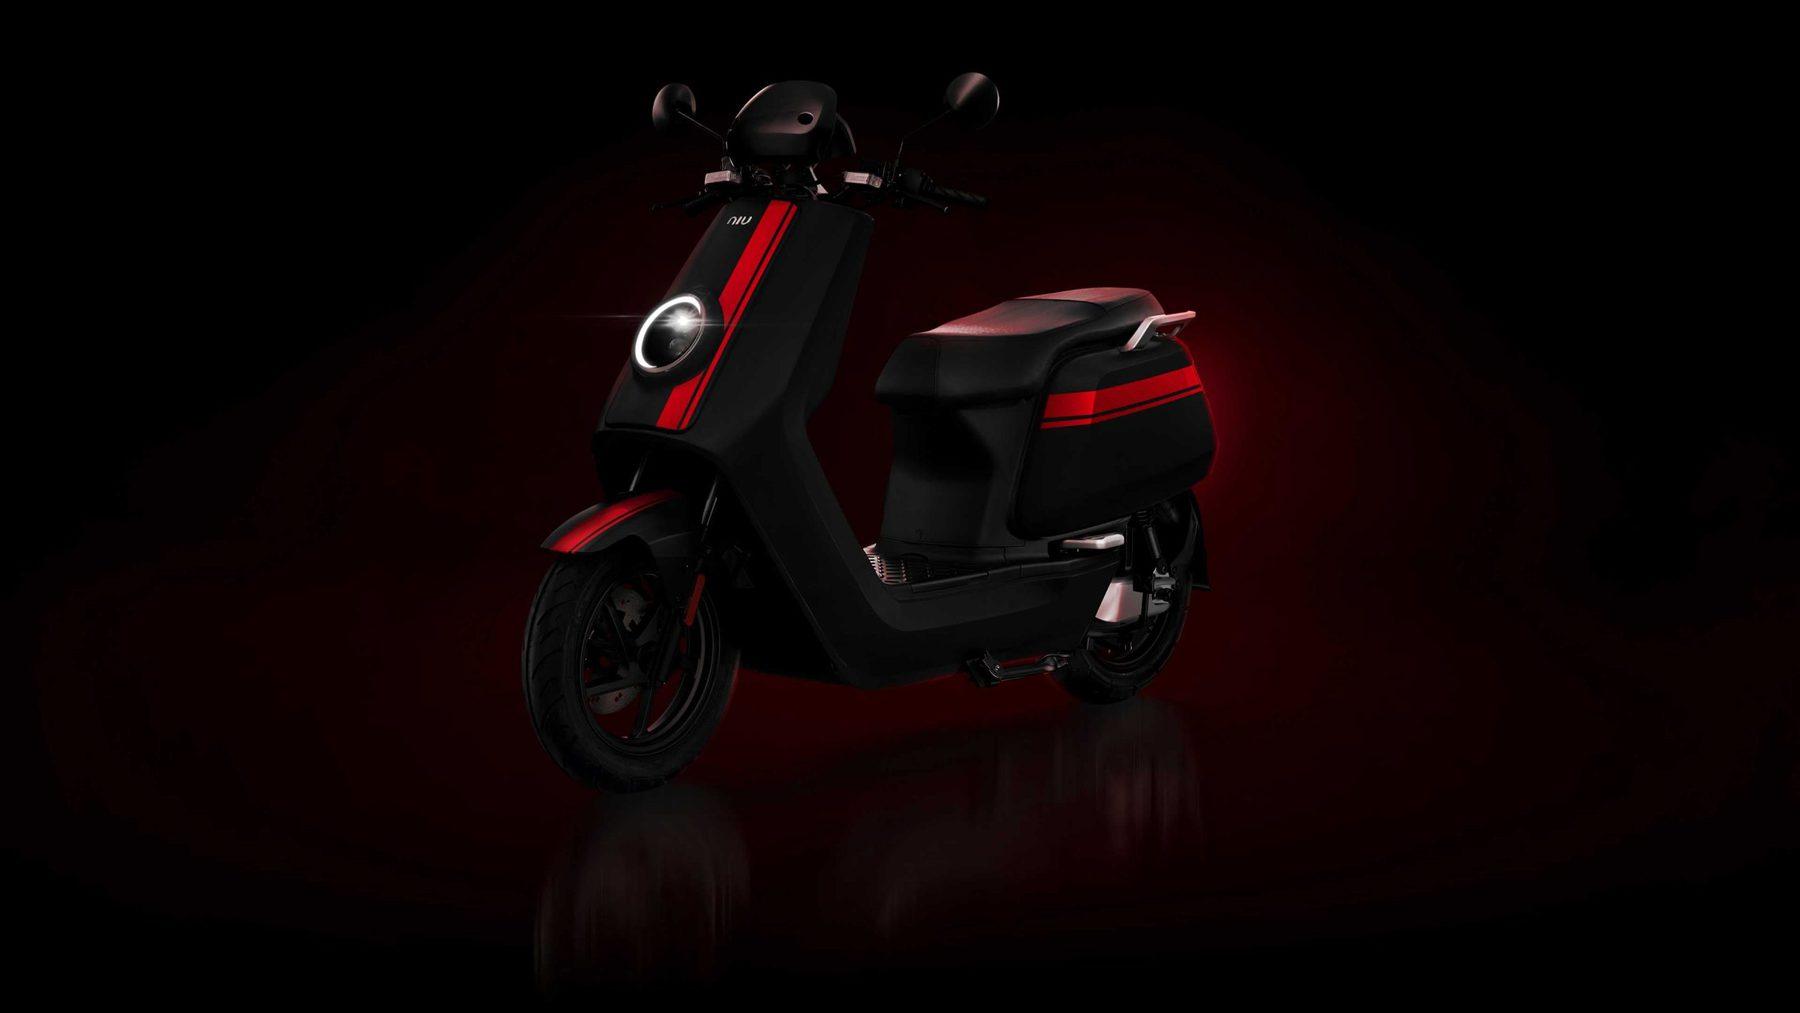 NIU smart technology scooter